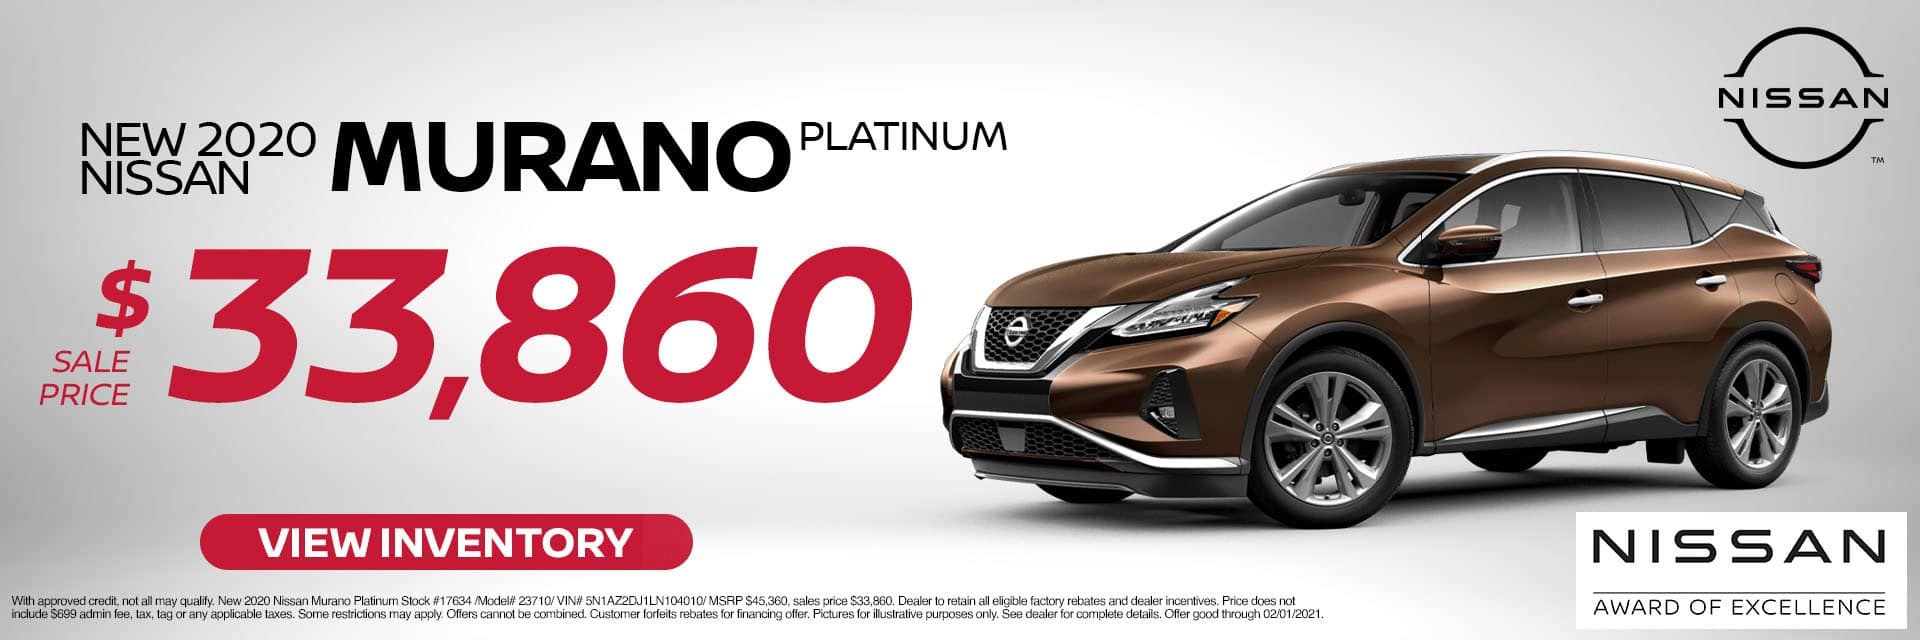 1CNSN-January 2021-2020 Nissan Murano